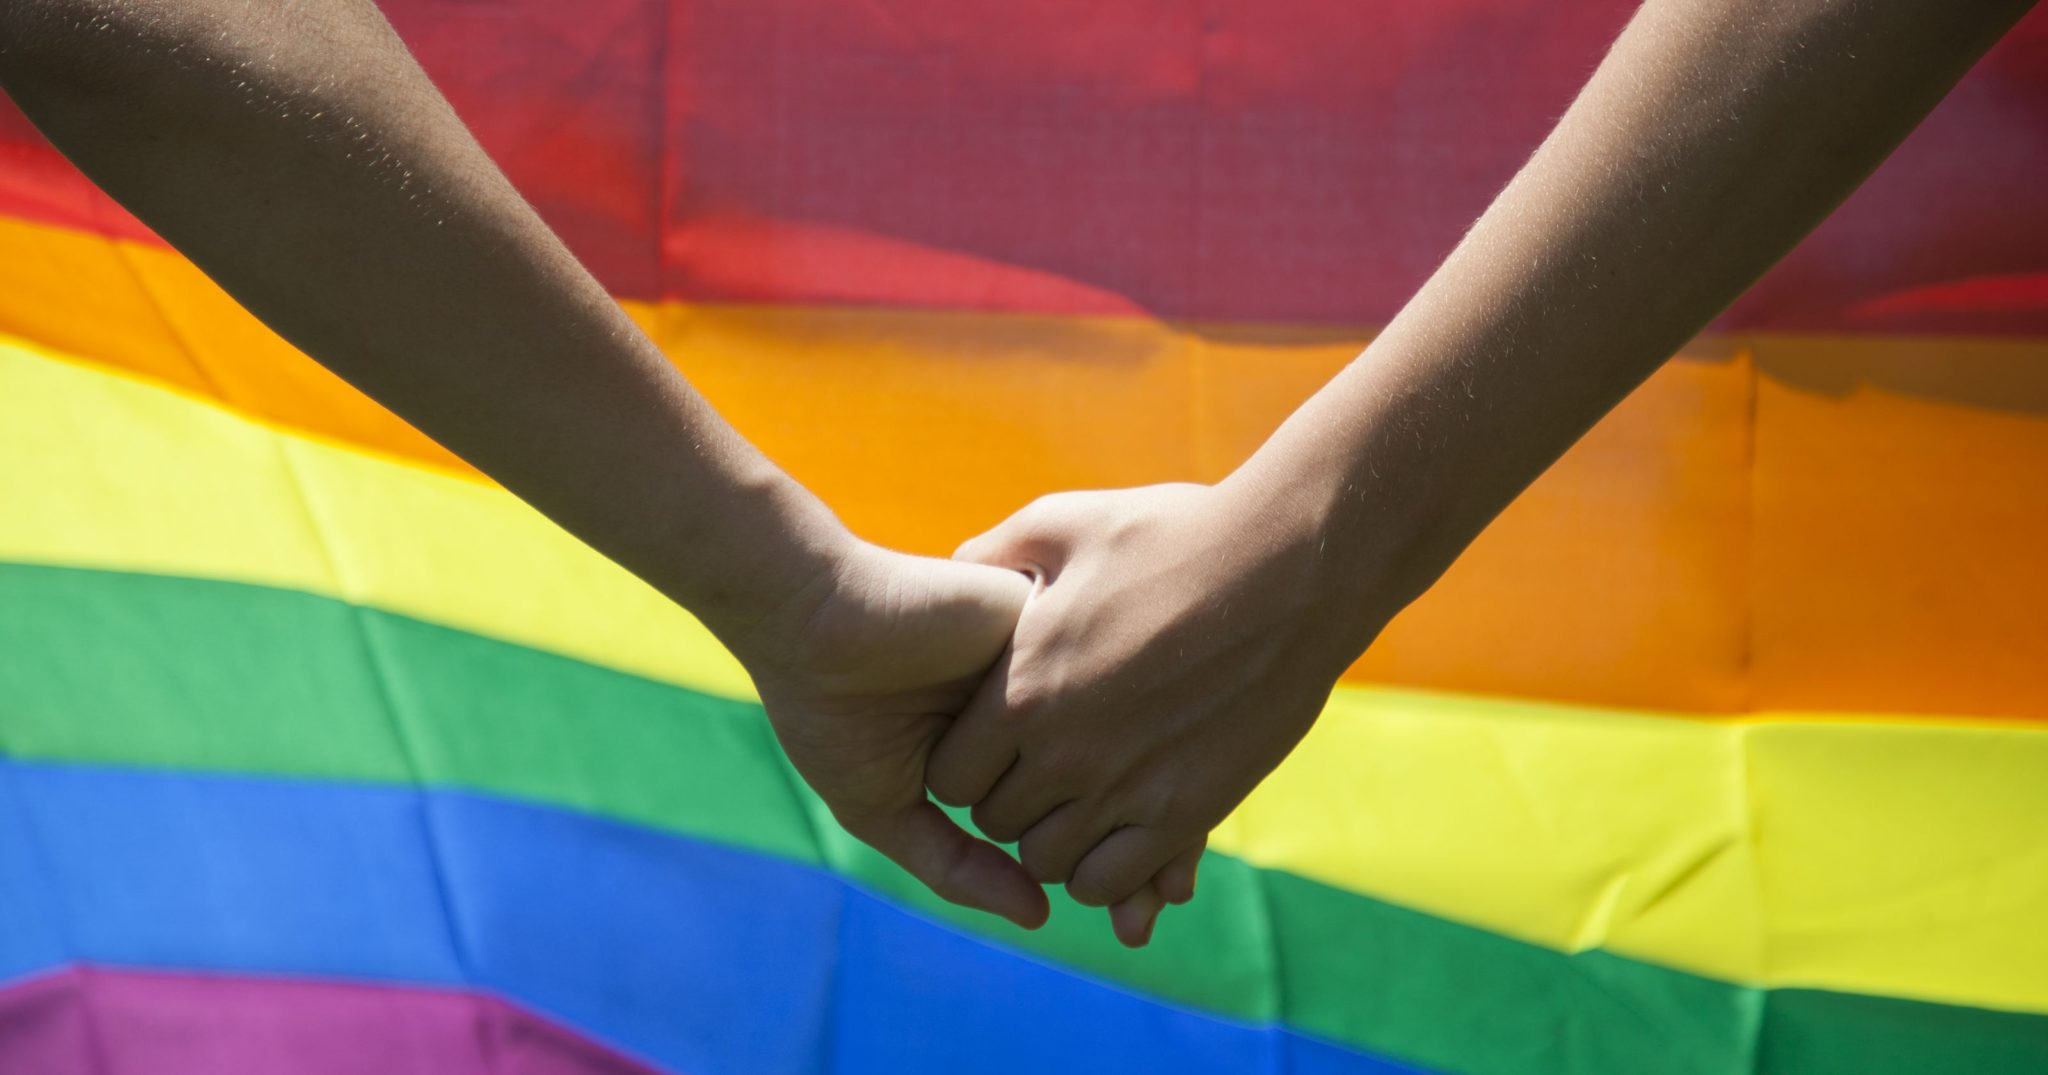 Psichiatria: quando l'omosessualità era nel DSM